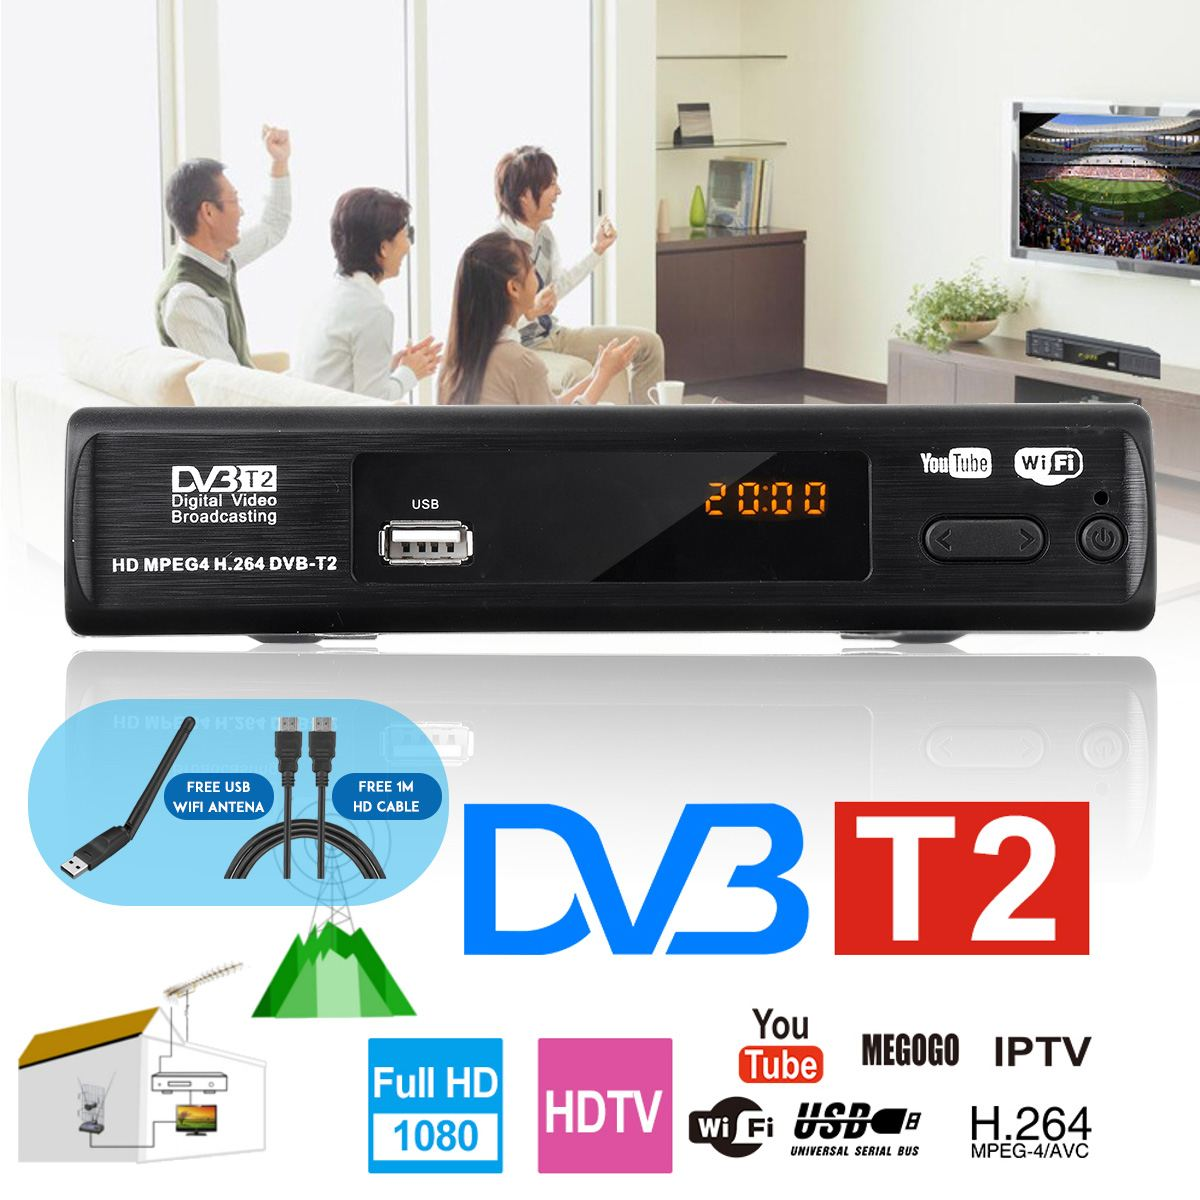 HD 1080p Tv Tuner Dvb T2 Vga TV Dvb-t2 For Monitor Adapter Tuner Receiver Satellite Decoder Dvbt2 Tv Box Tuner Russian Manual